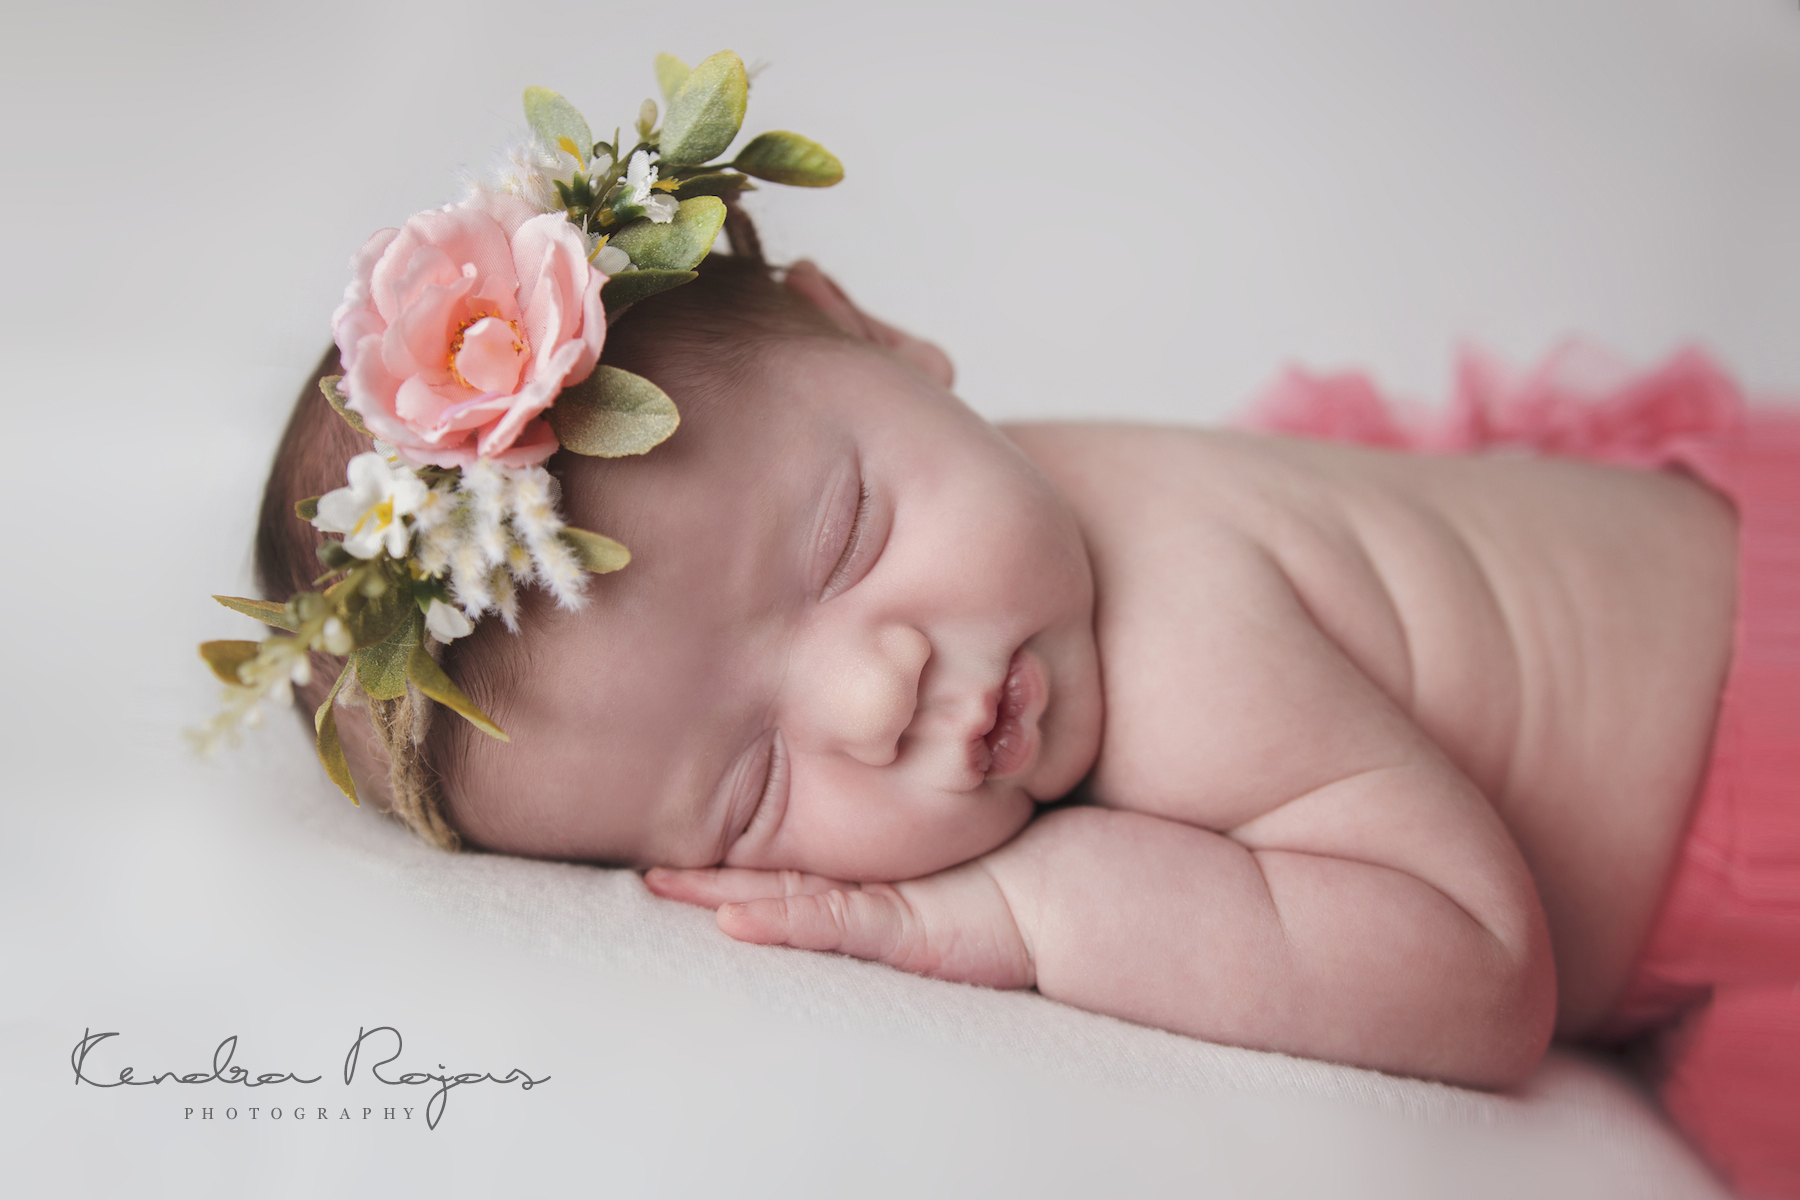 Newborn_Charlotte 112216_01_LOW_Social.jpg